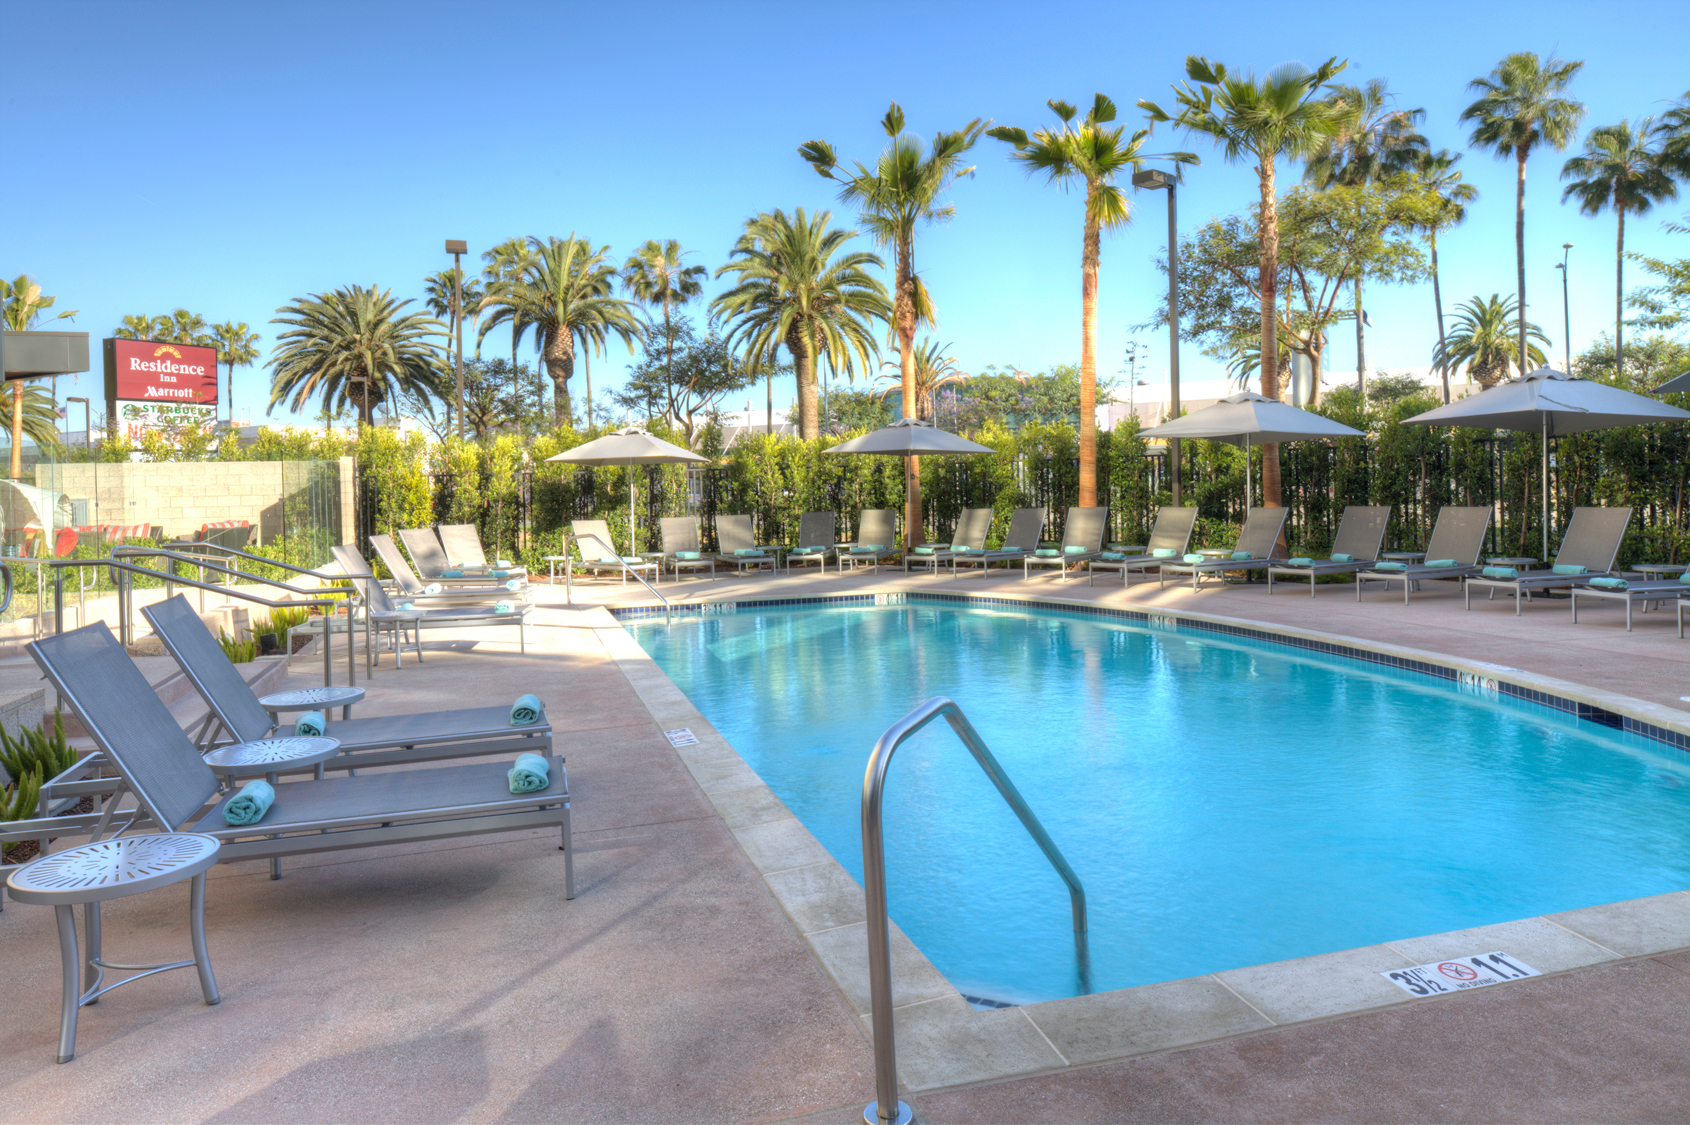 Residence Inn by Marriott Los Angeles LAX/Century Boulevard image 27